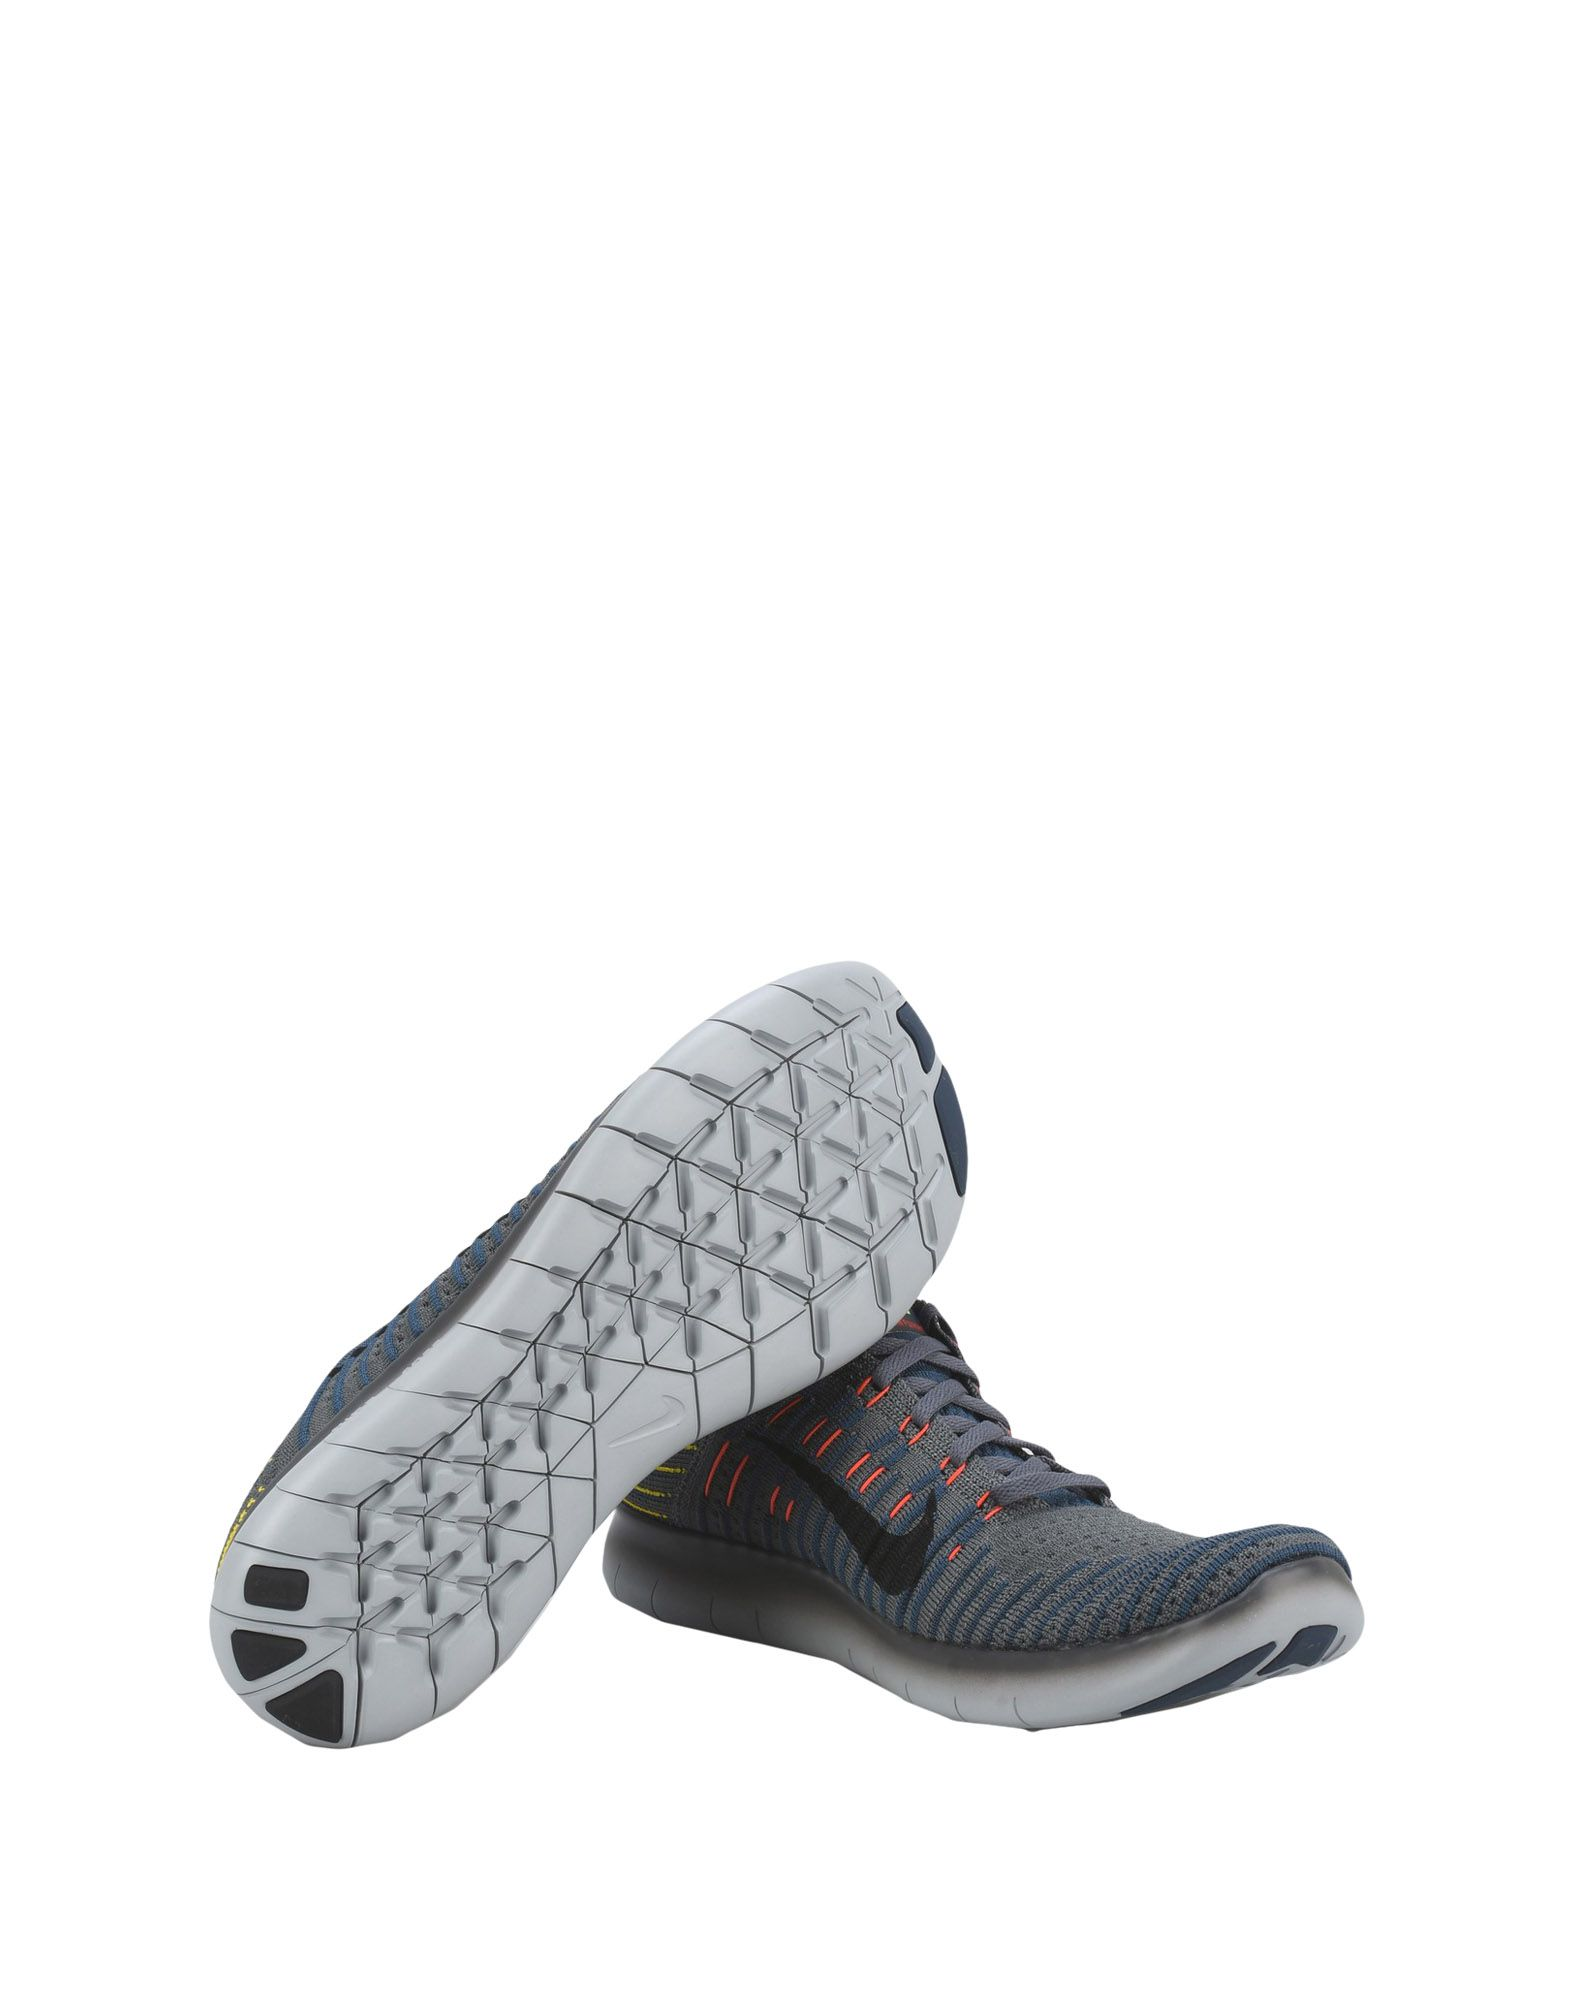 Nike  Free Run Flyknit  11227765OL Gute Qualität beliebte Schuhe